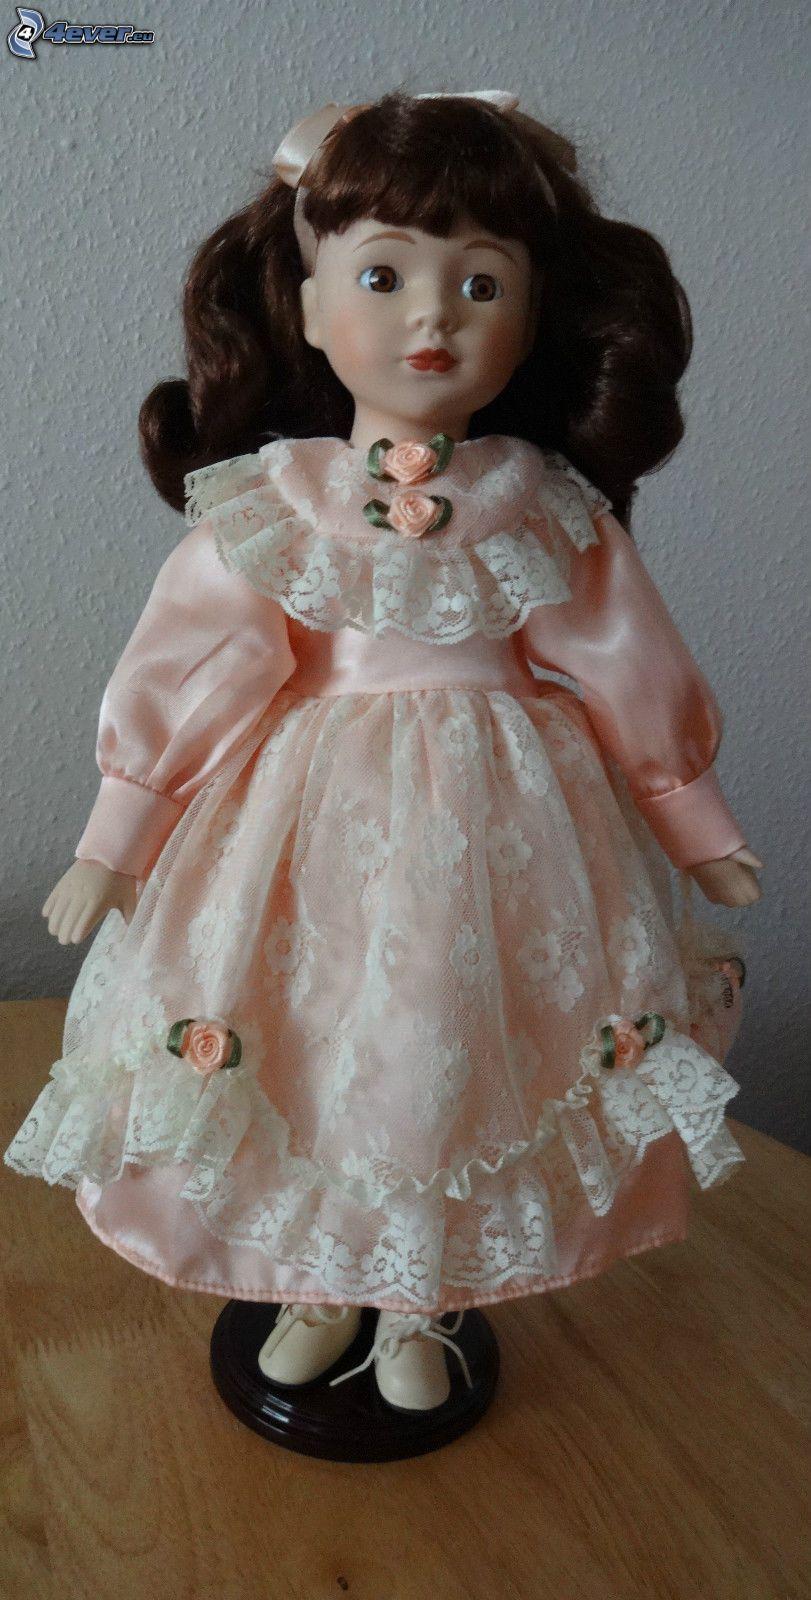 50cfab3f3722 bambola di porcellana